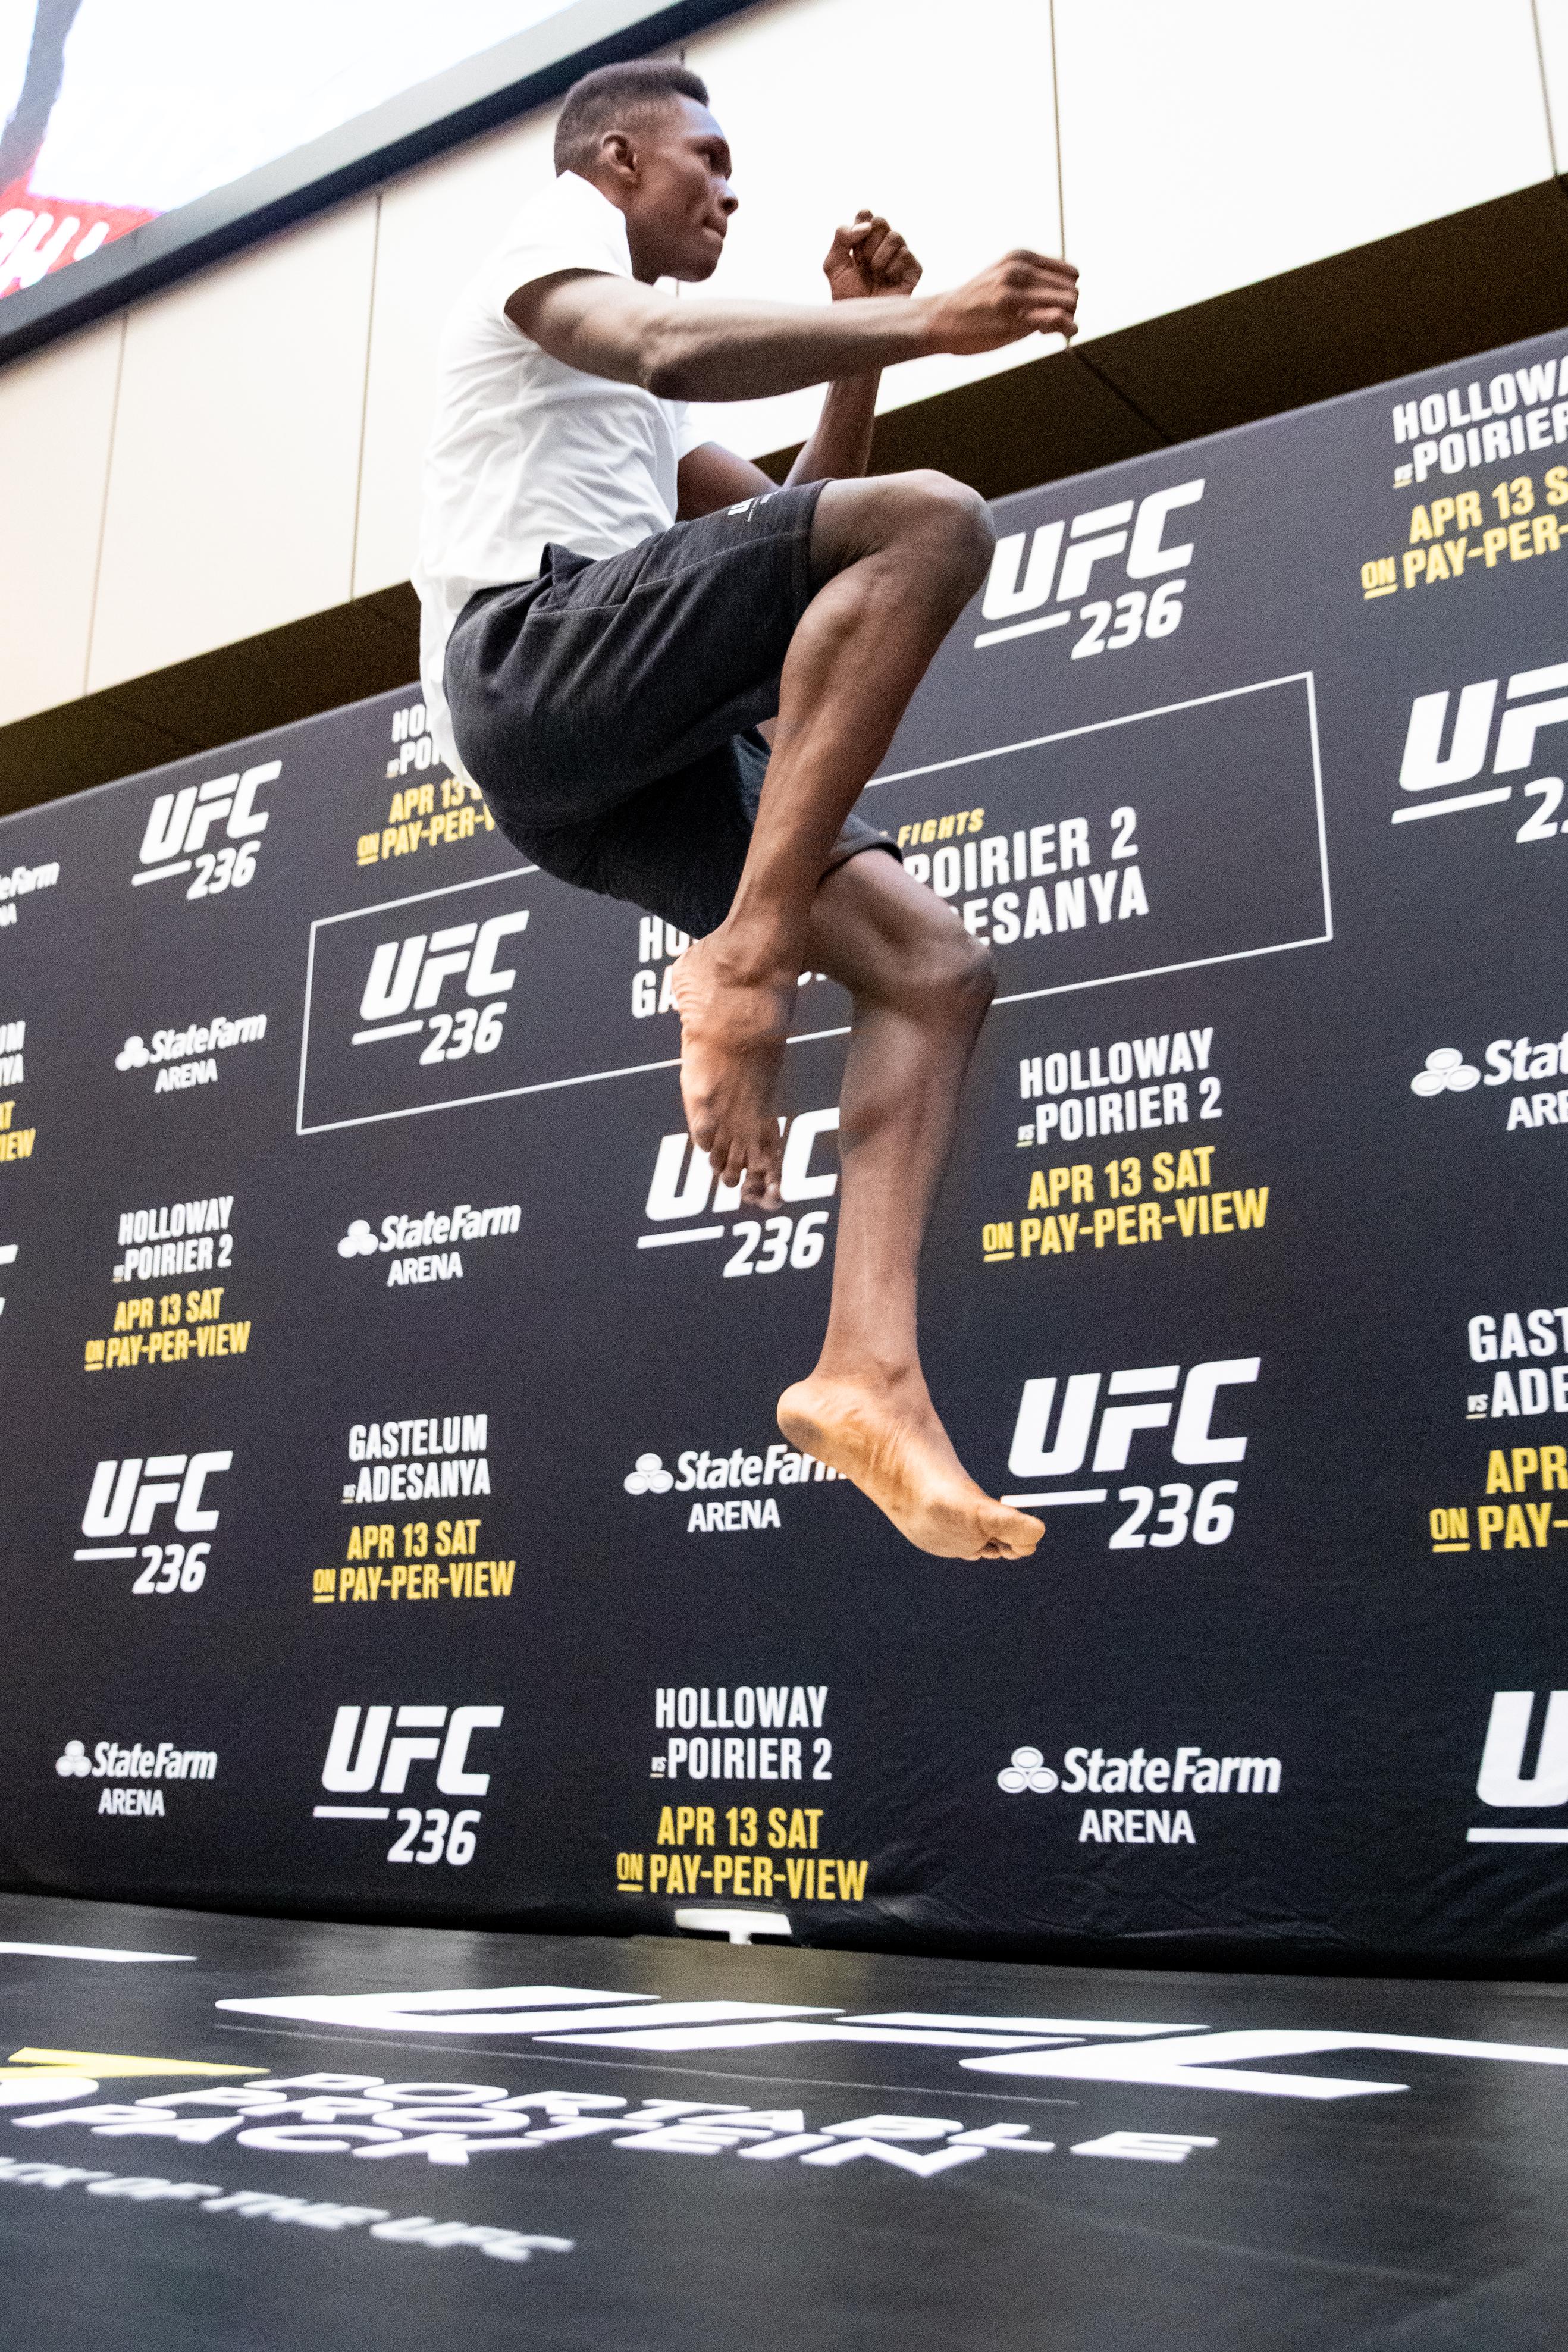 UFC 236 Holloway v Poirier 2: Open Workouts